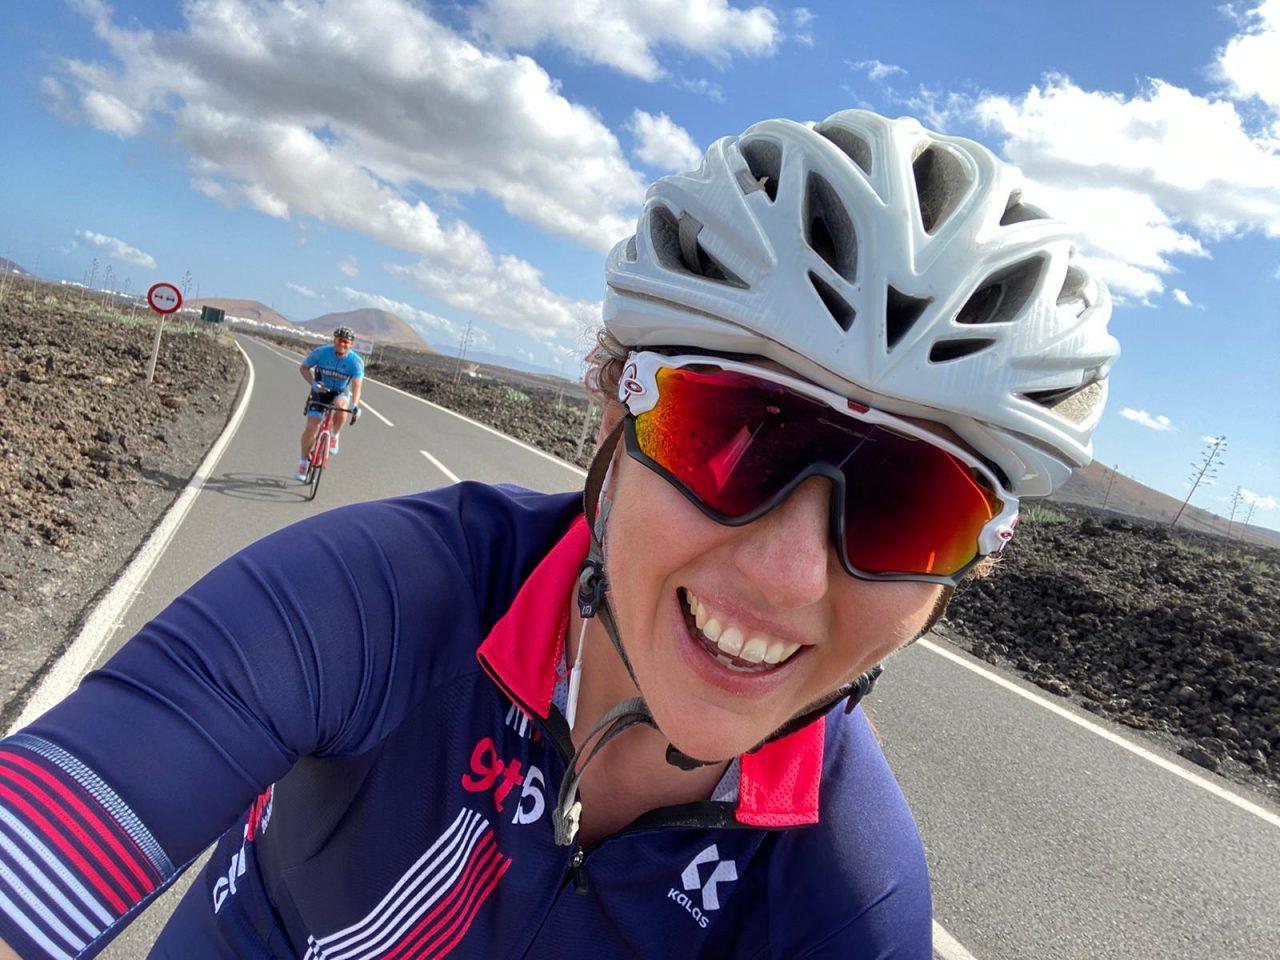 34-year-old woman set for Tour de France challenge